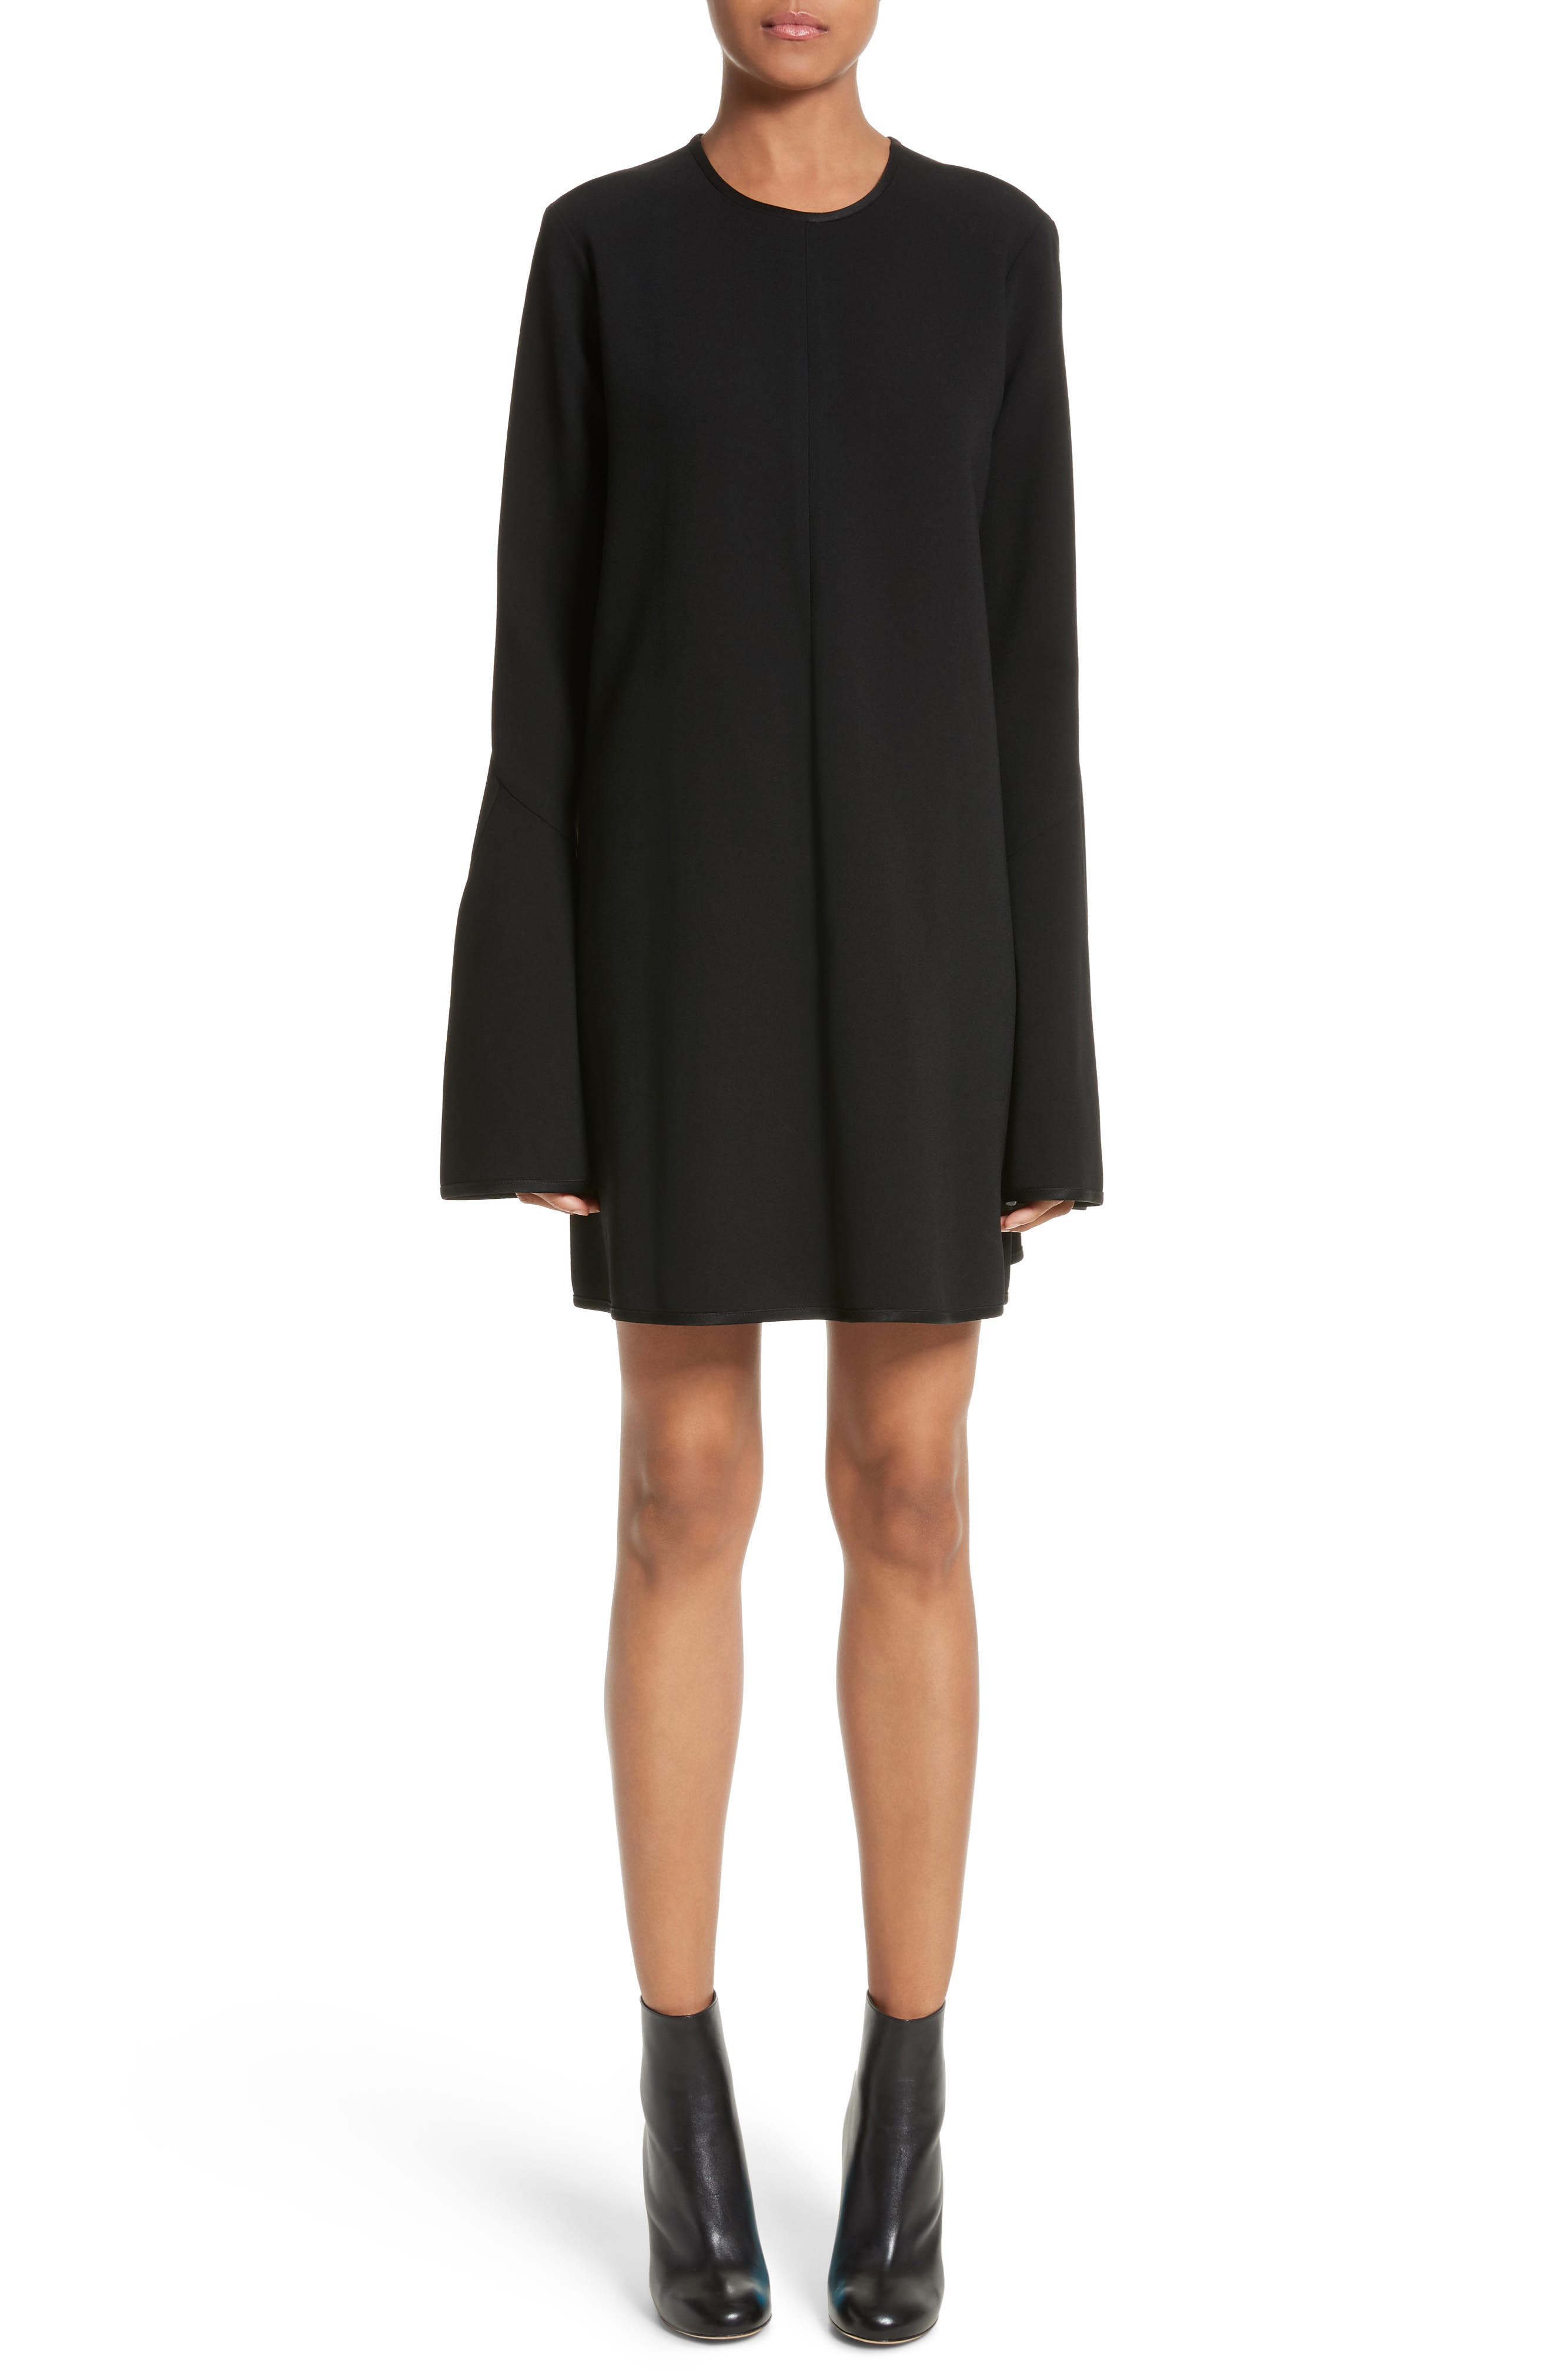 Preacher Flare Sleeve Minidress,                             Main thumbnail 1, color,                             Black